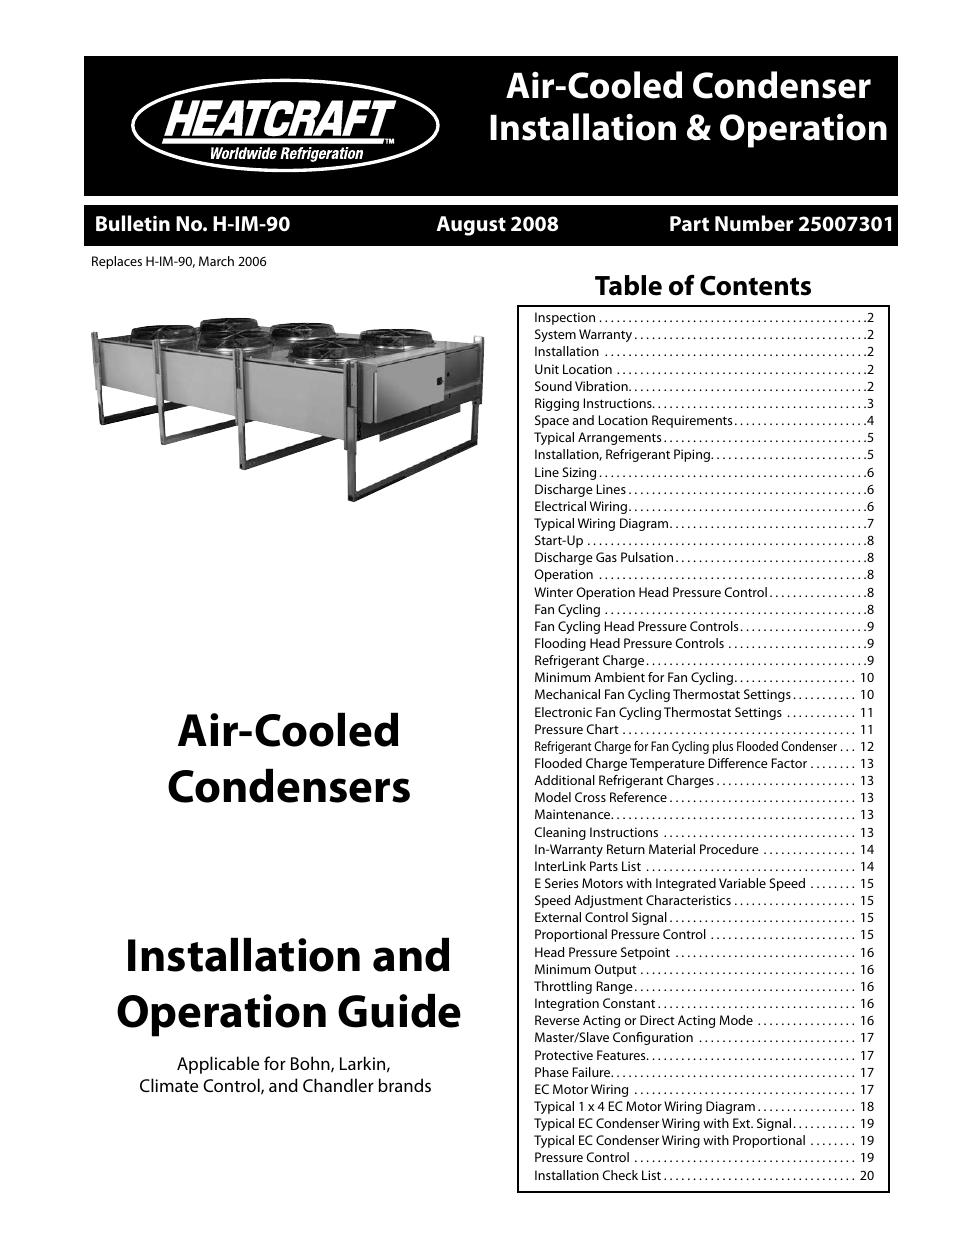 heatcraft wiring diagram for model let090bk